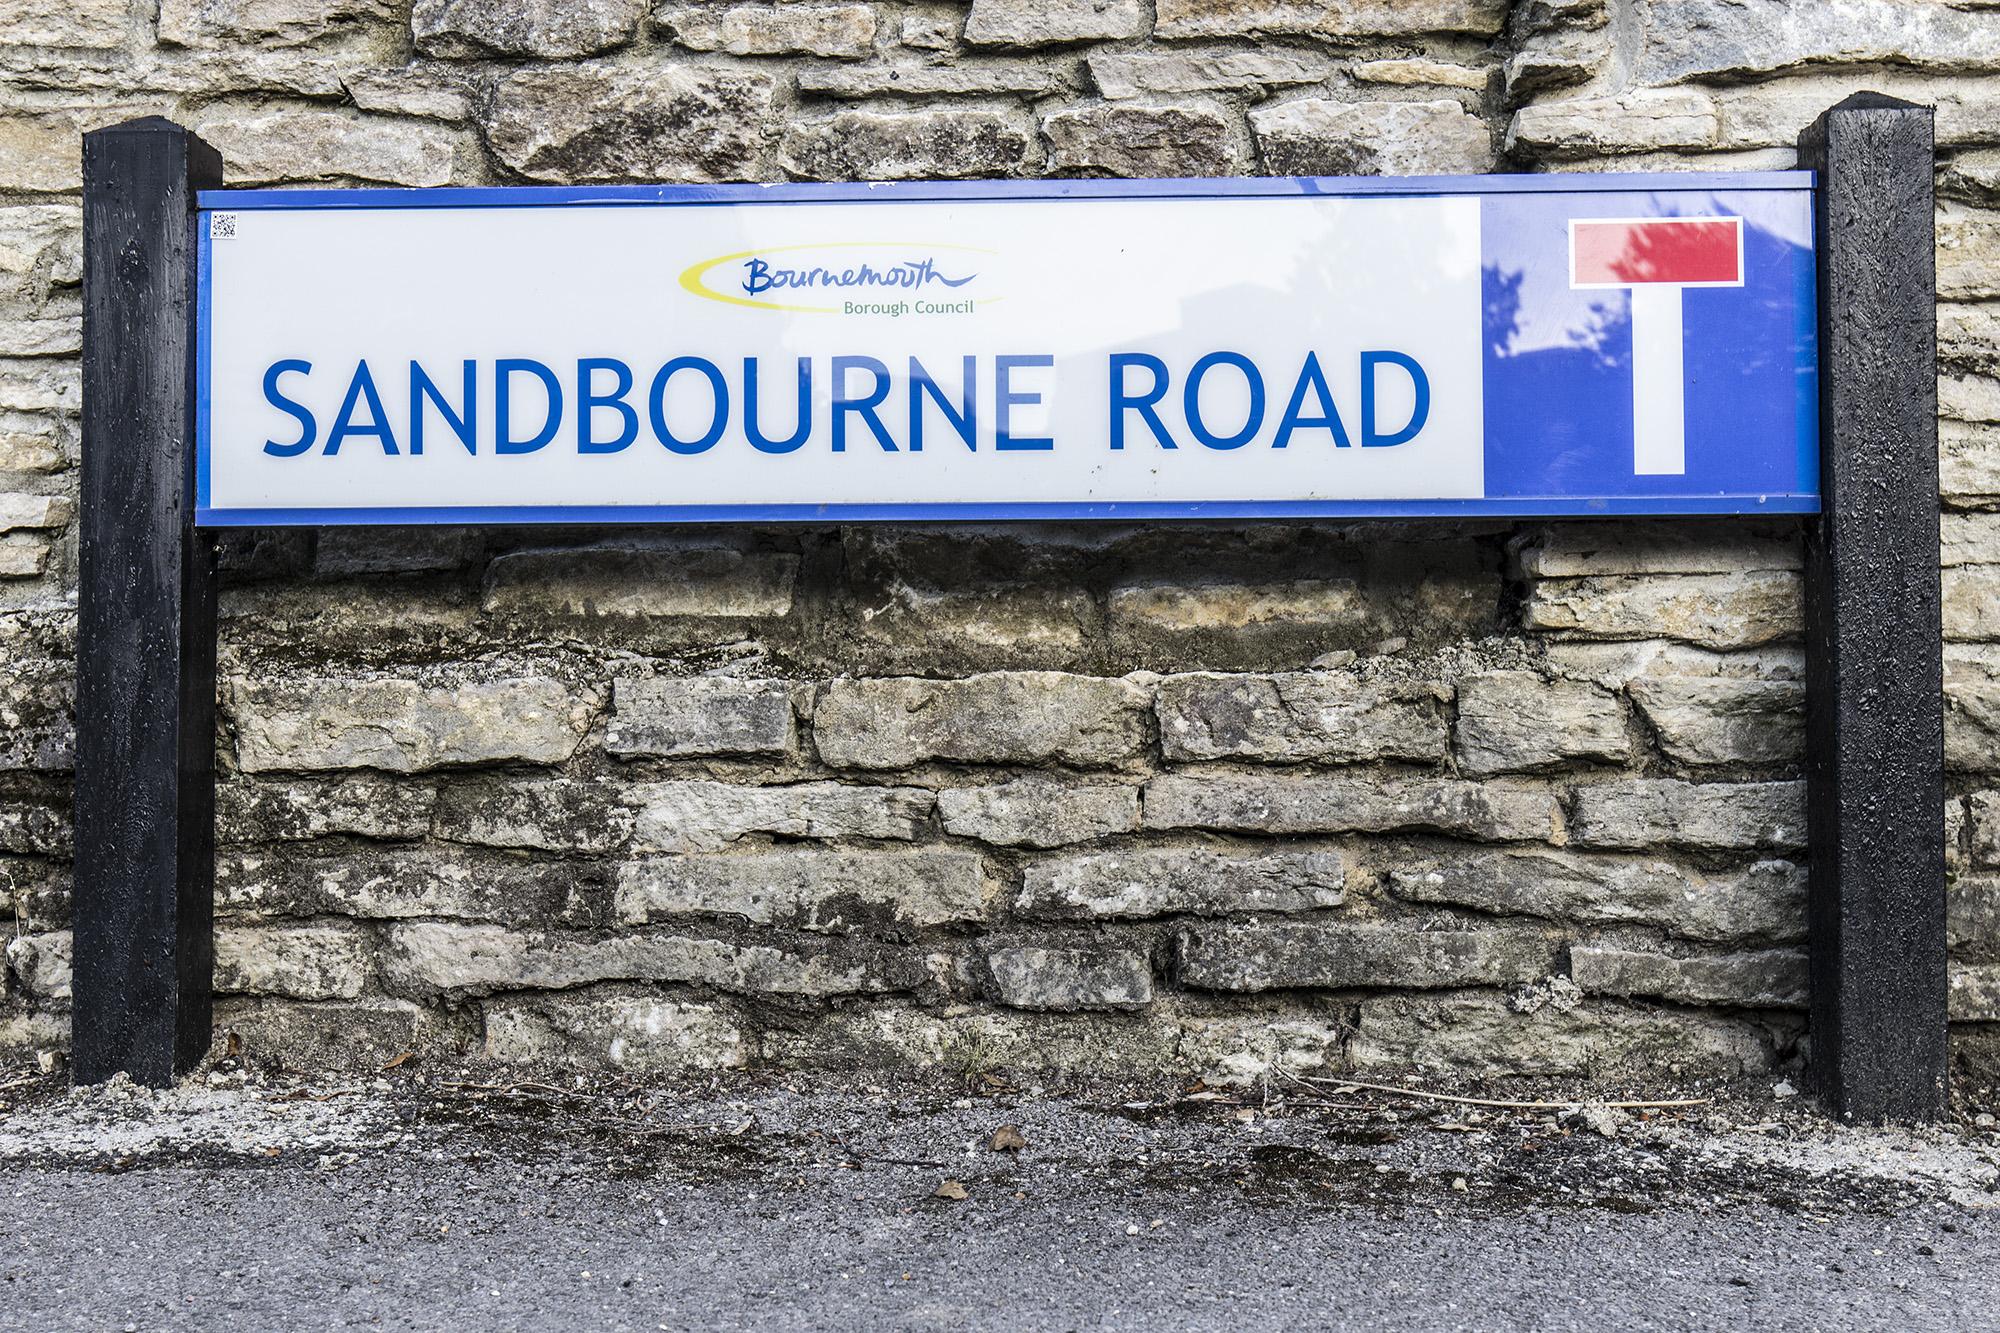 Sandbourne Road, Westbourne, Bournemouth